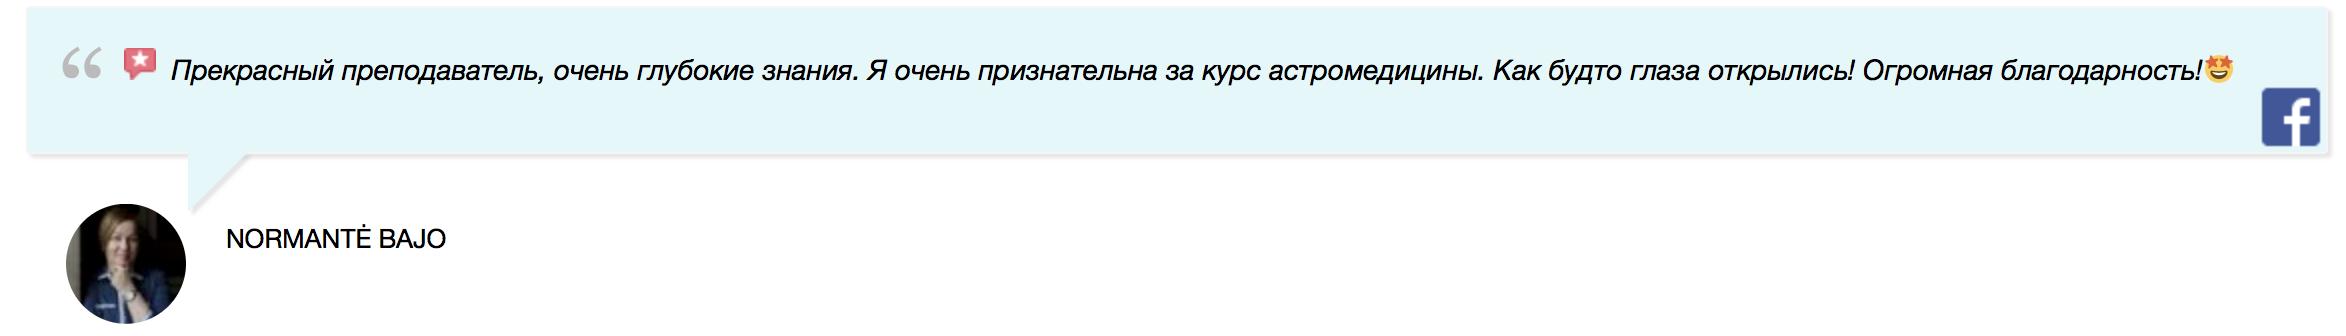 https://astrologtasha.ru/wp-content/uploads/2021/02/Screen-Shot-2021-02-09-at-11.36.10-AM.png